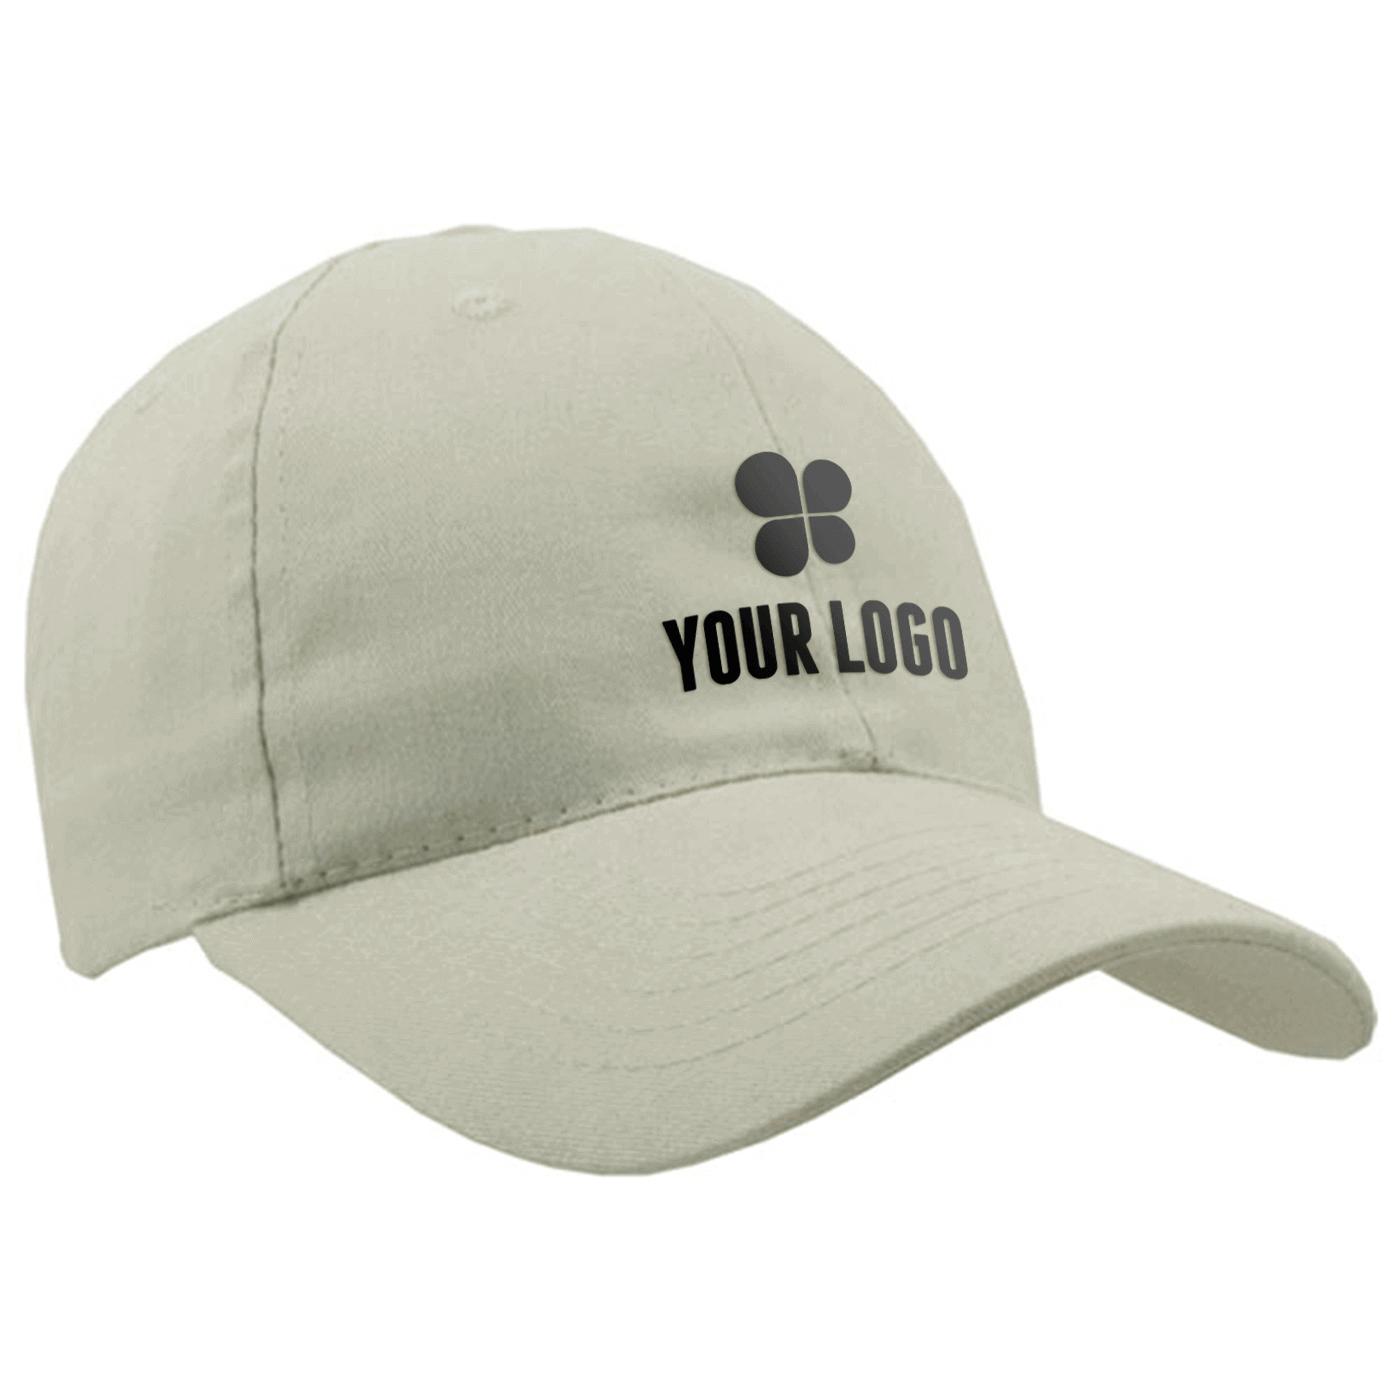 Lightweight Brushed Cotton Twill Cap